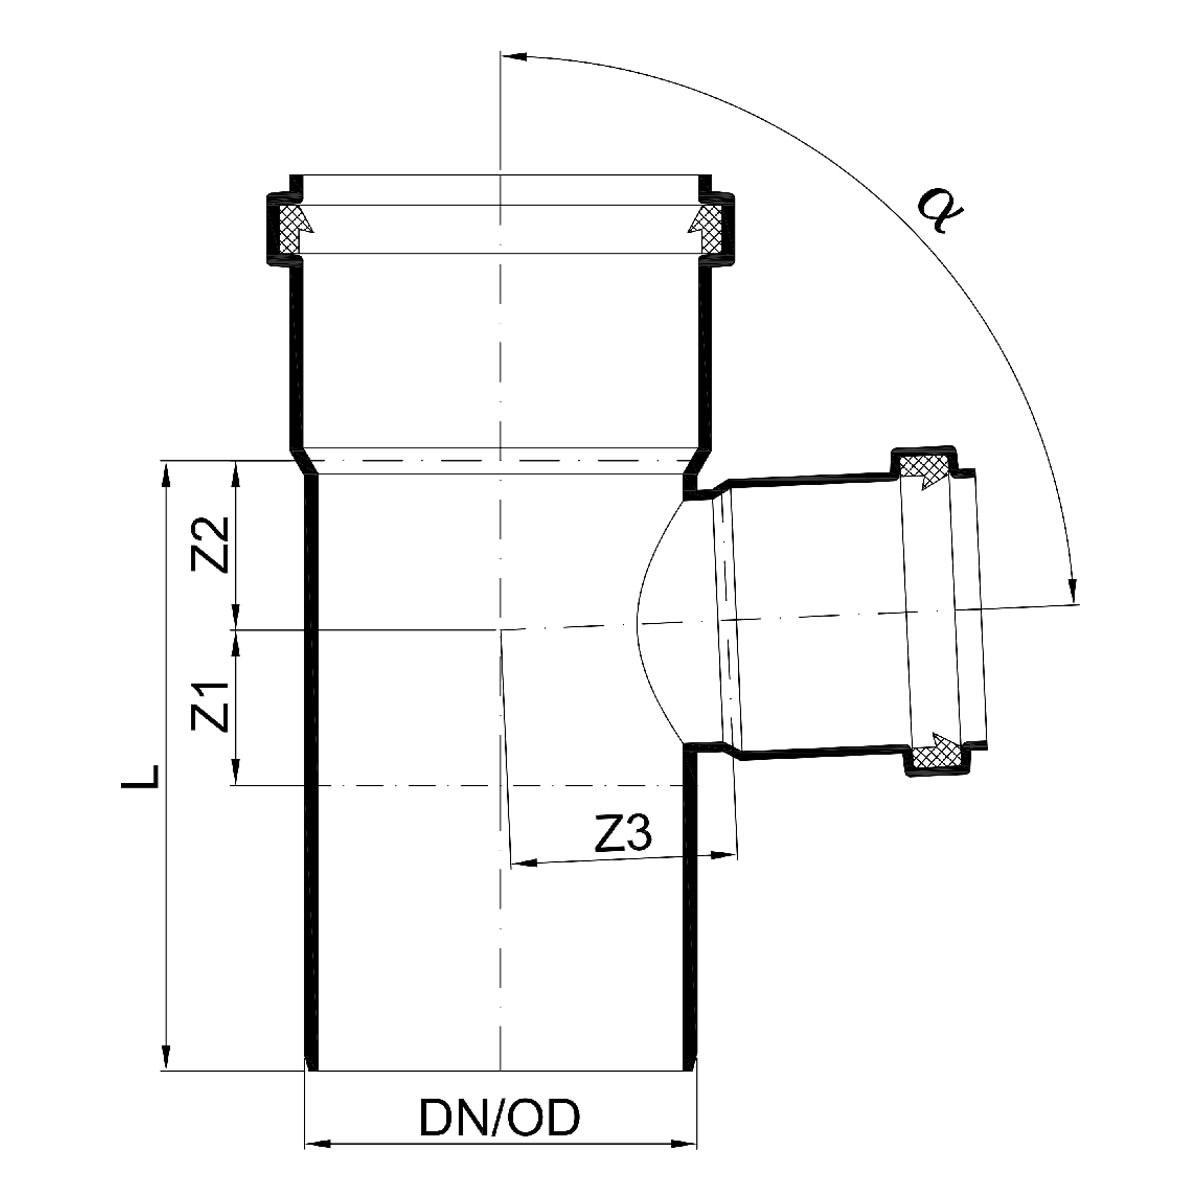 Favorit POLO-KAL NG Abflussrohr-Abzweig 87,5° mit Muffen - DN 160 / 110 RE94